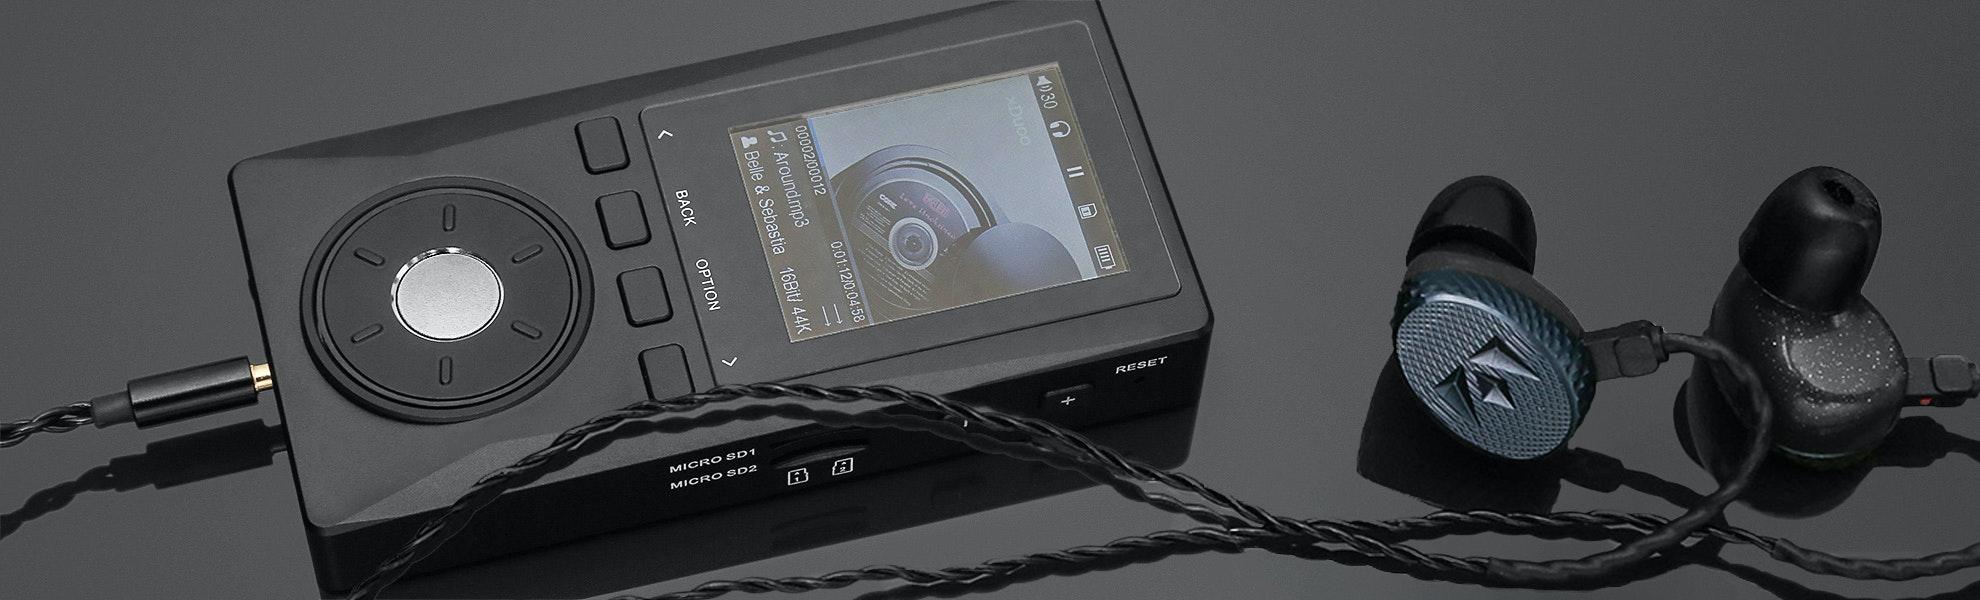 XDuoo X10 Digital Audio Player